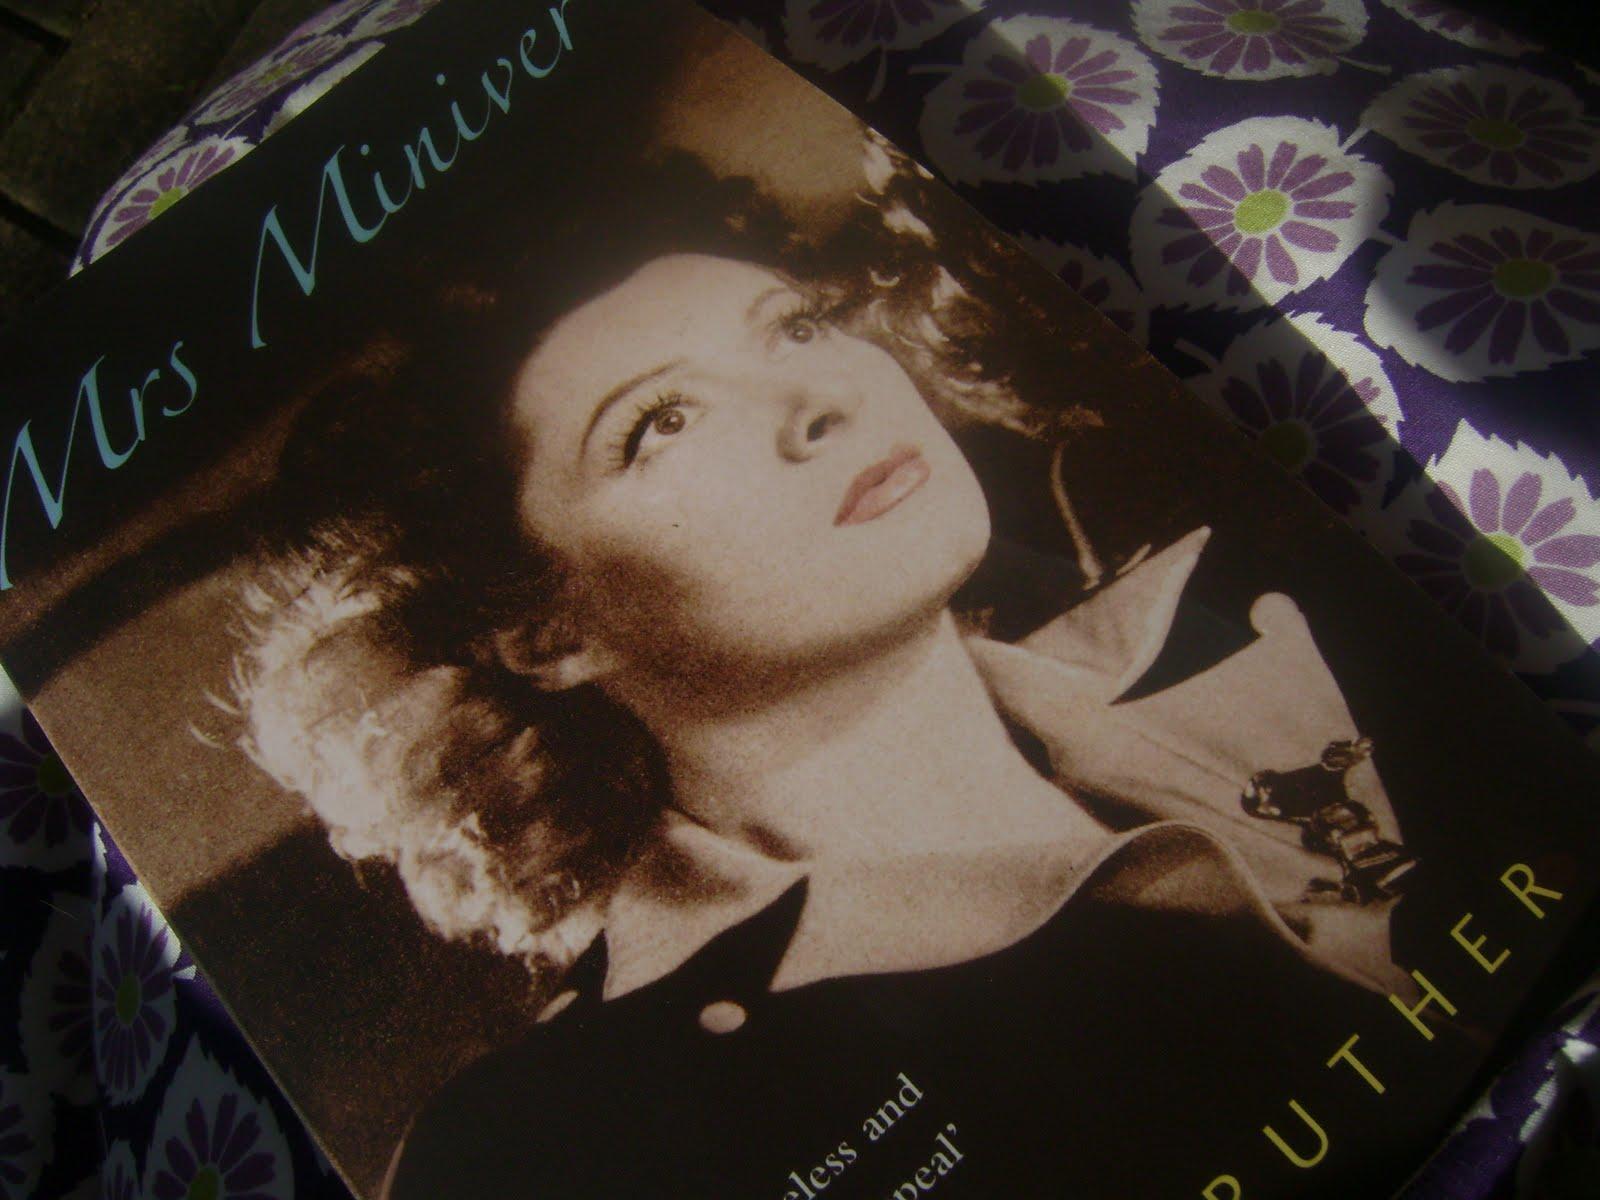 Vintage Reads Mrs Miniver